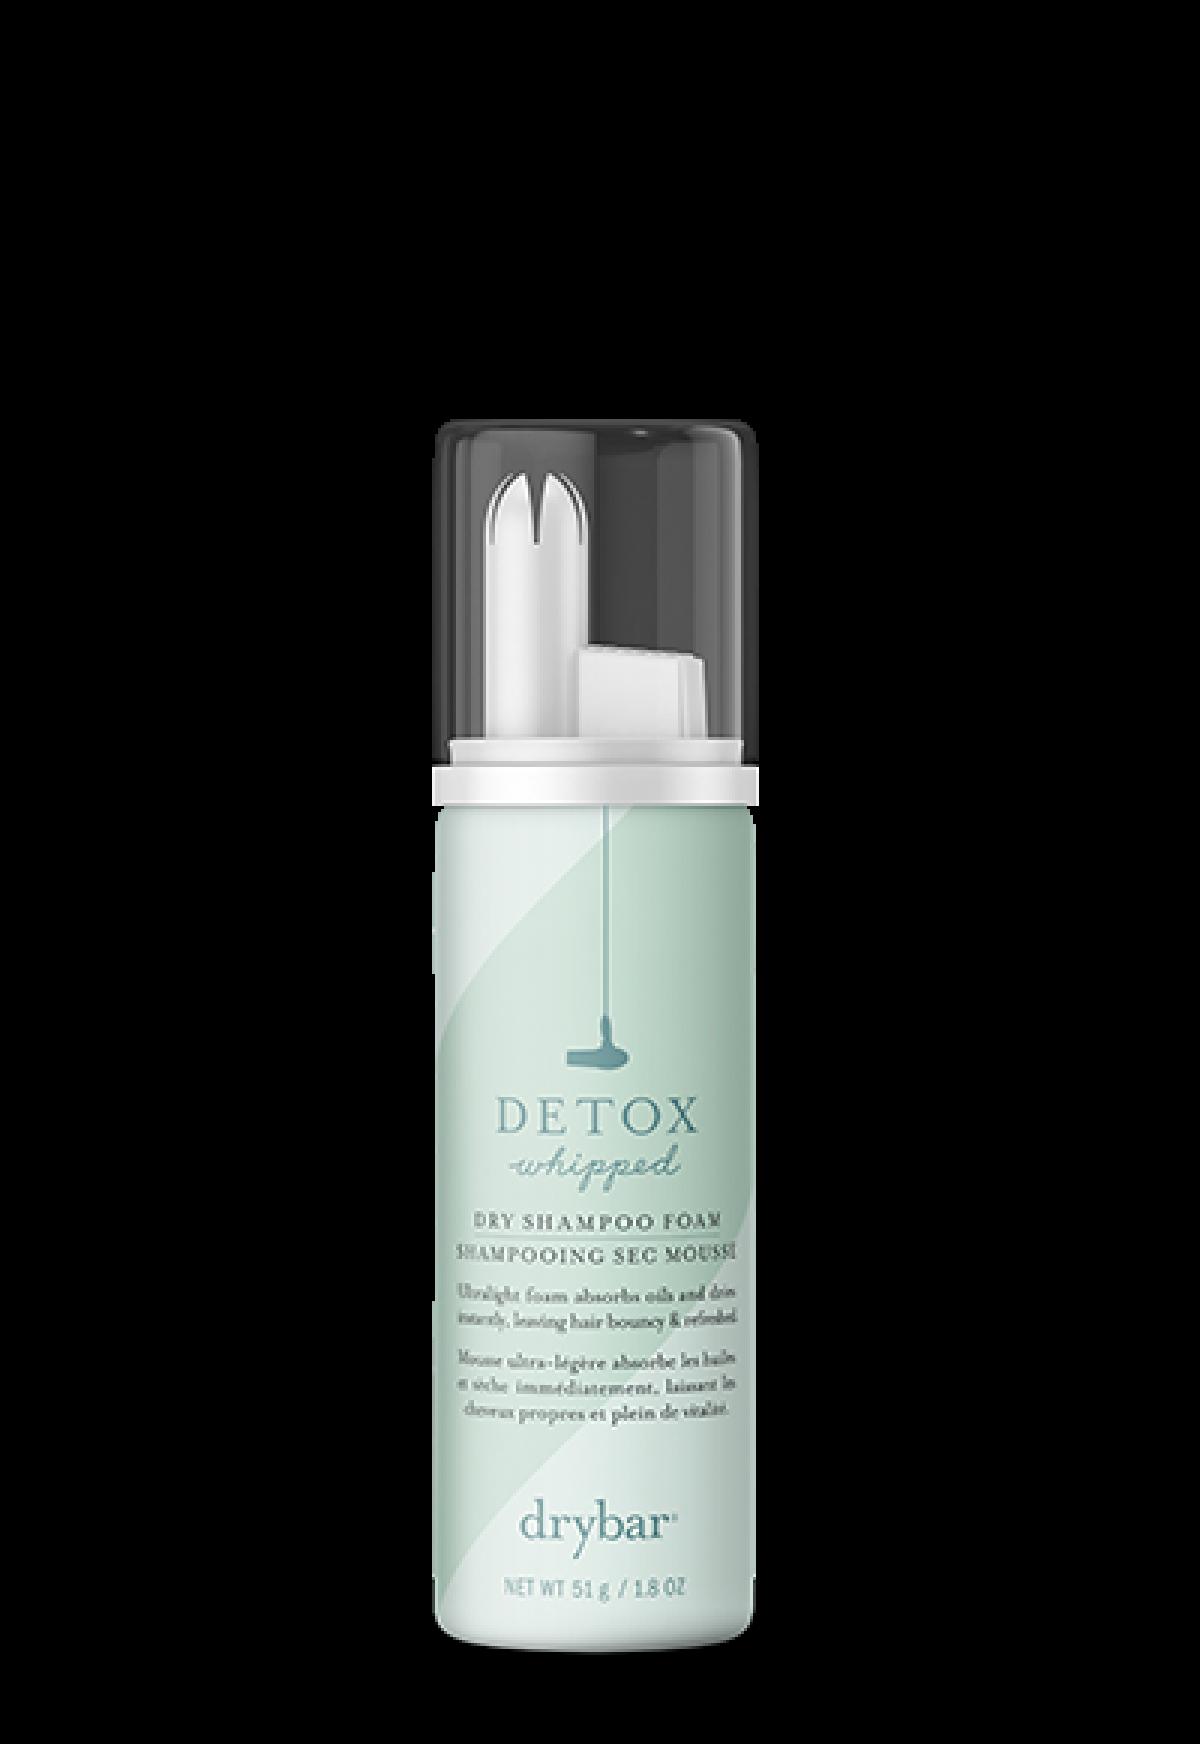 Drybar Detox Whipped Whip Your Blowout Back To Life Dry Shampoo Foam Full 3 5oz 24 00 19 20 Dry Shampoo Whip Detox